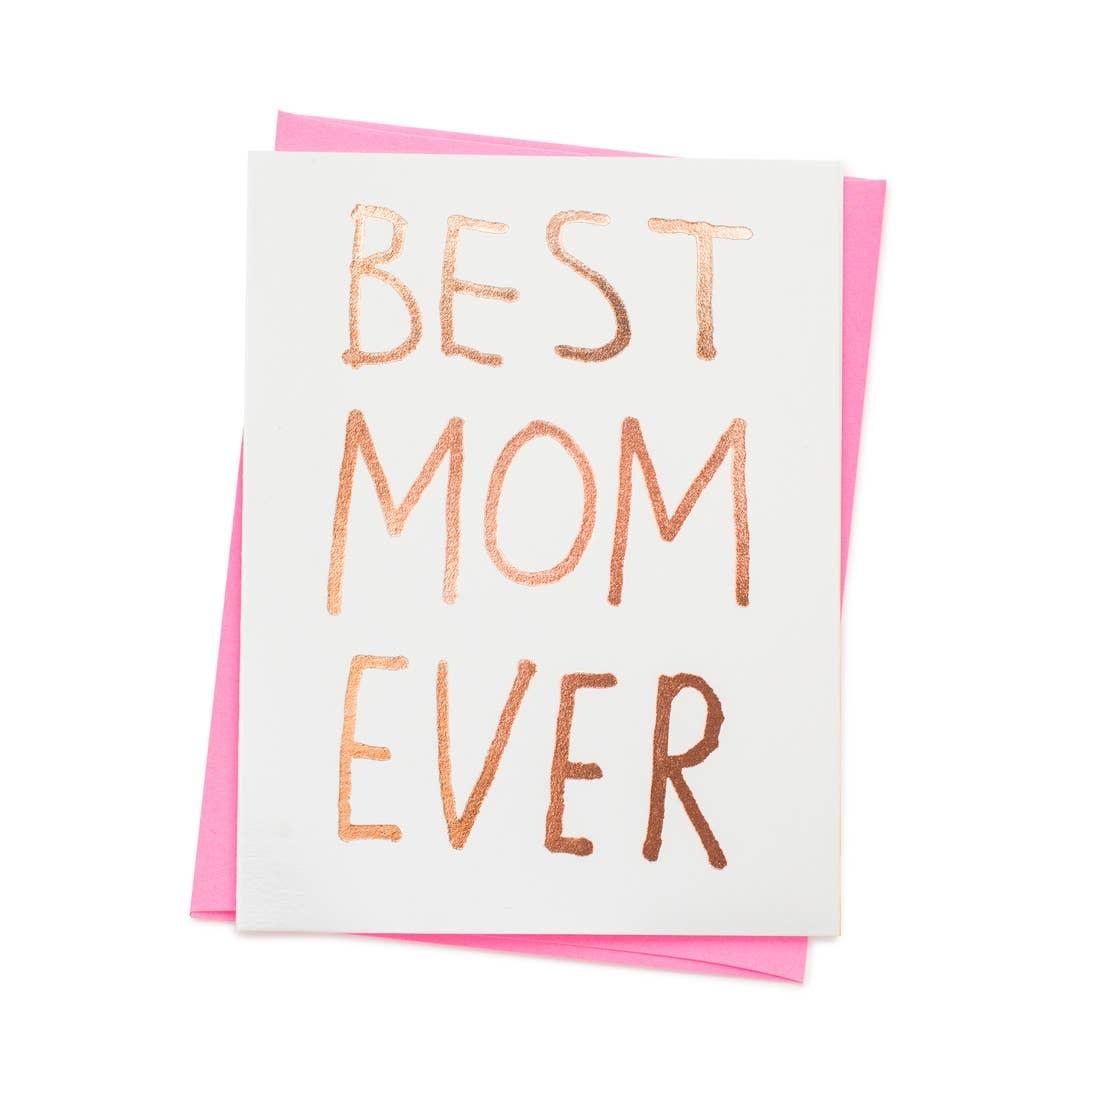 ASHKAHN & CO Best Mom Ever Card